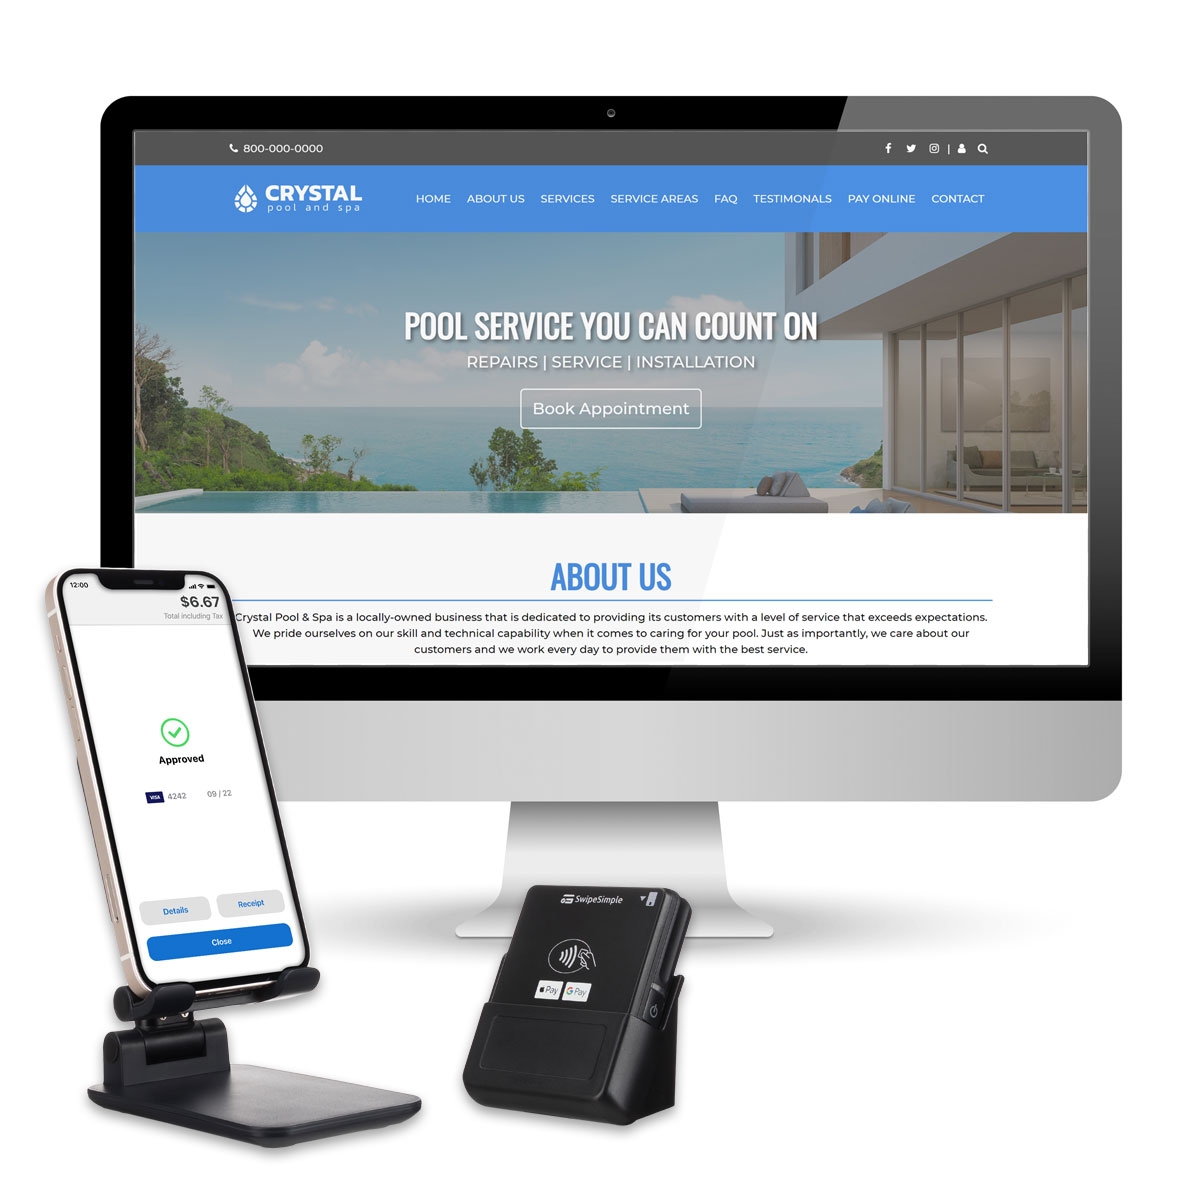 Get a free mobile card reader or free website